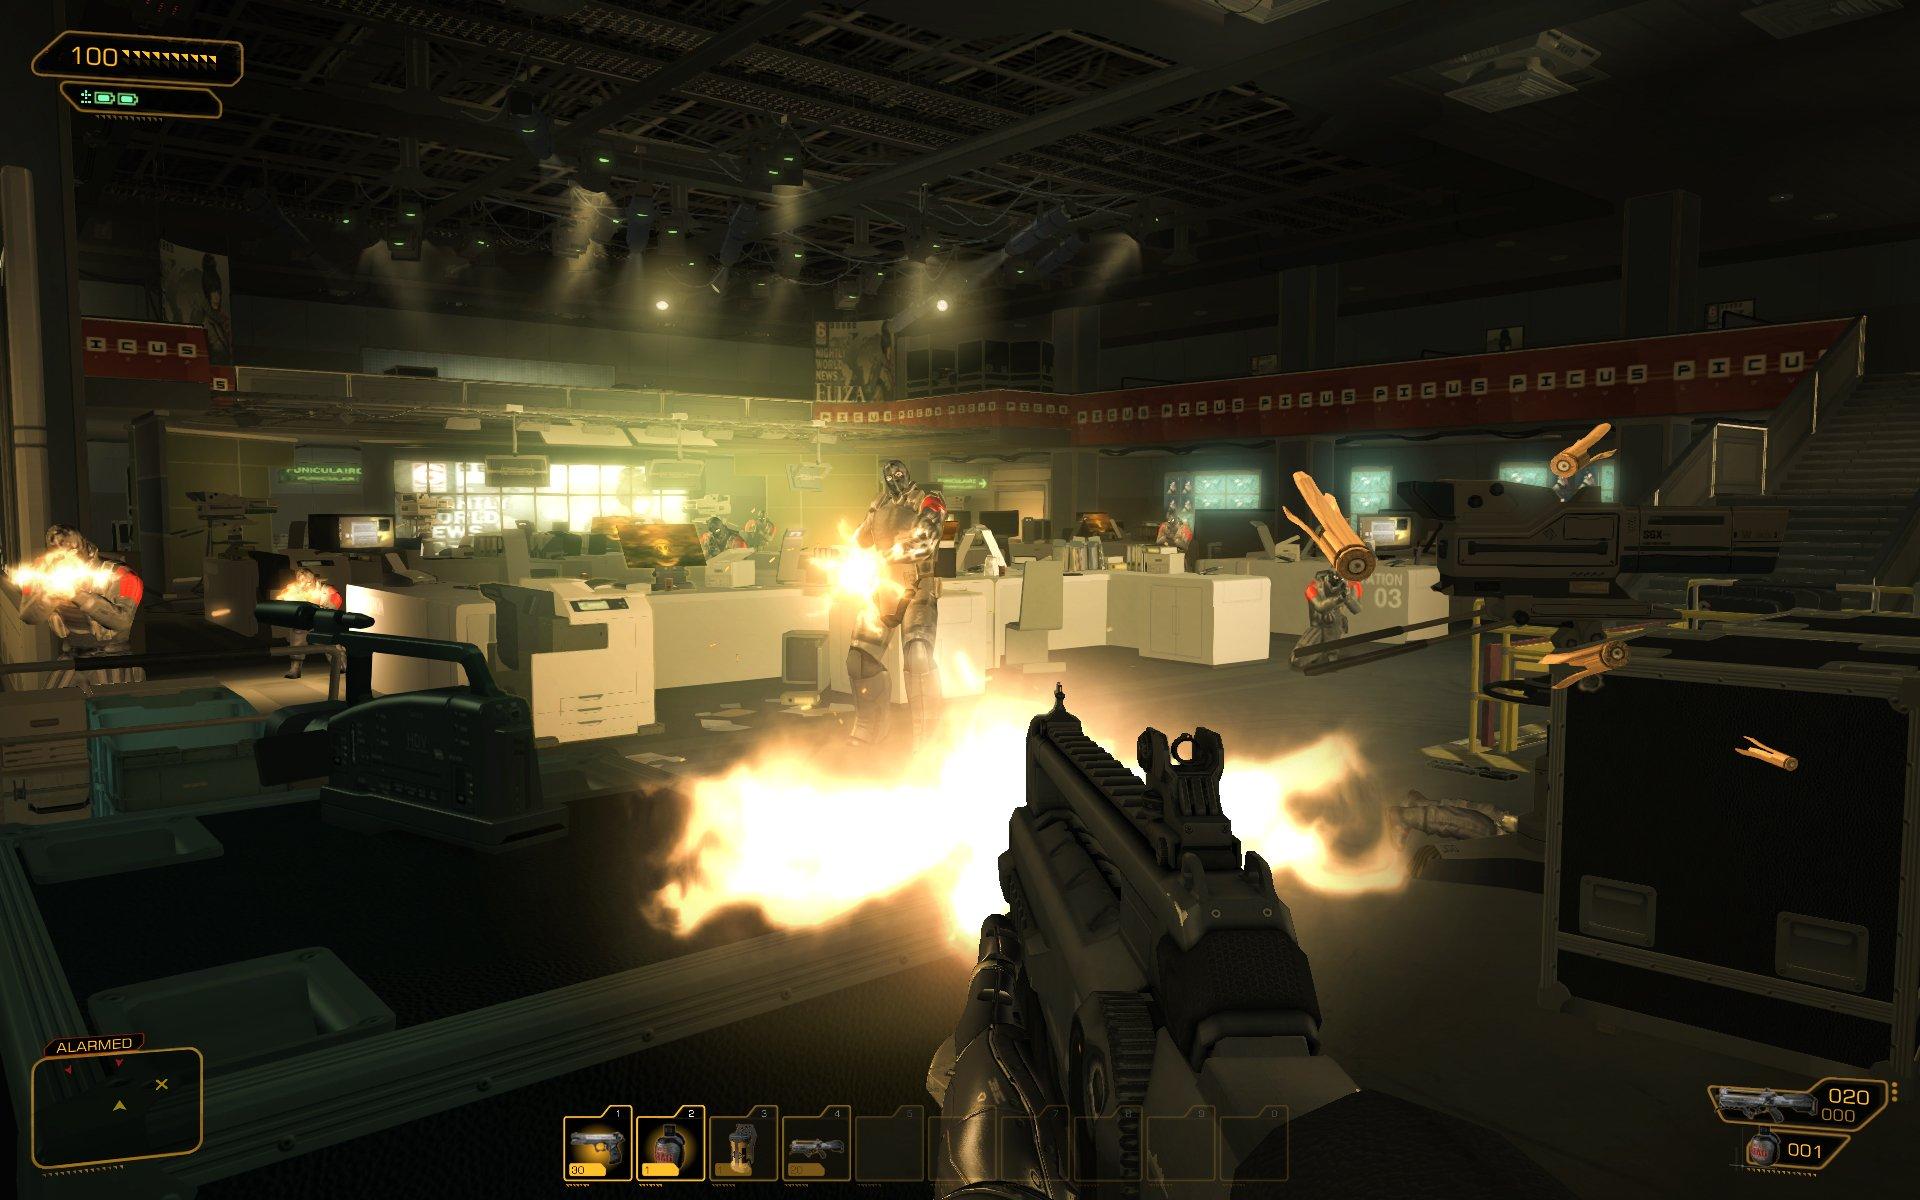 Deus-Ex-Human-Revolution-Screen